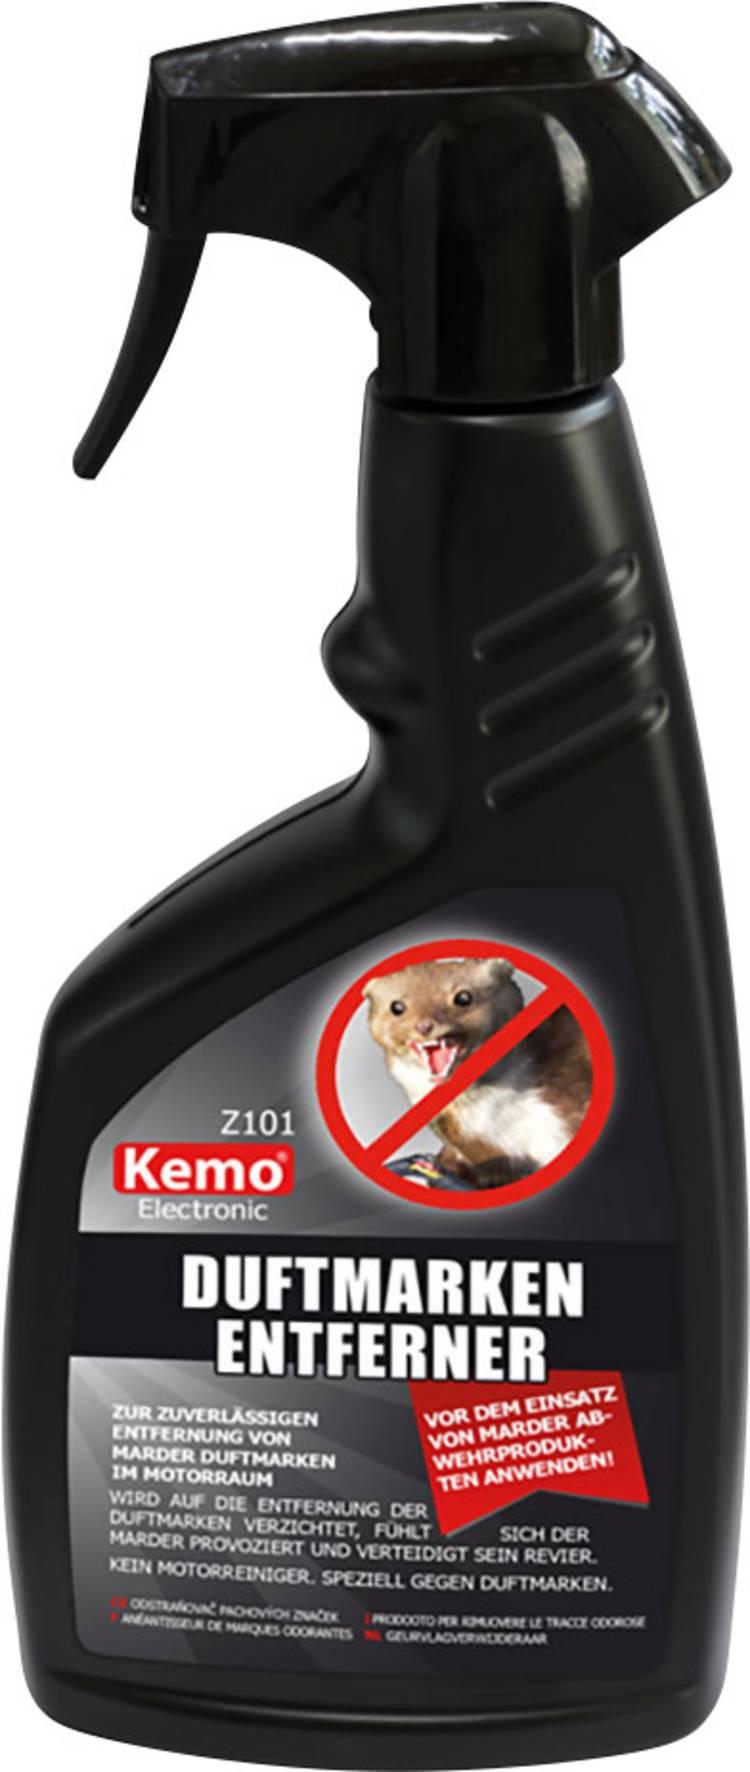 Kemo Z101 Anti-marterspray 500 ml